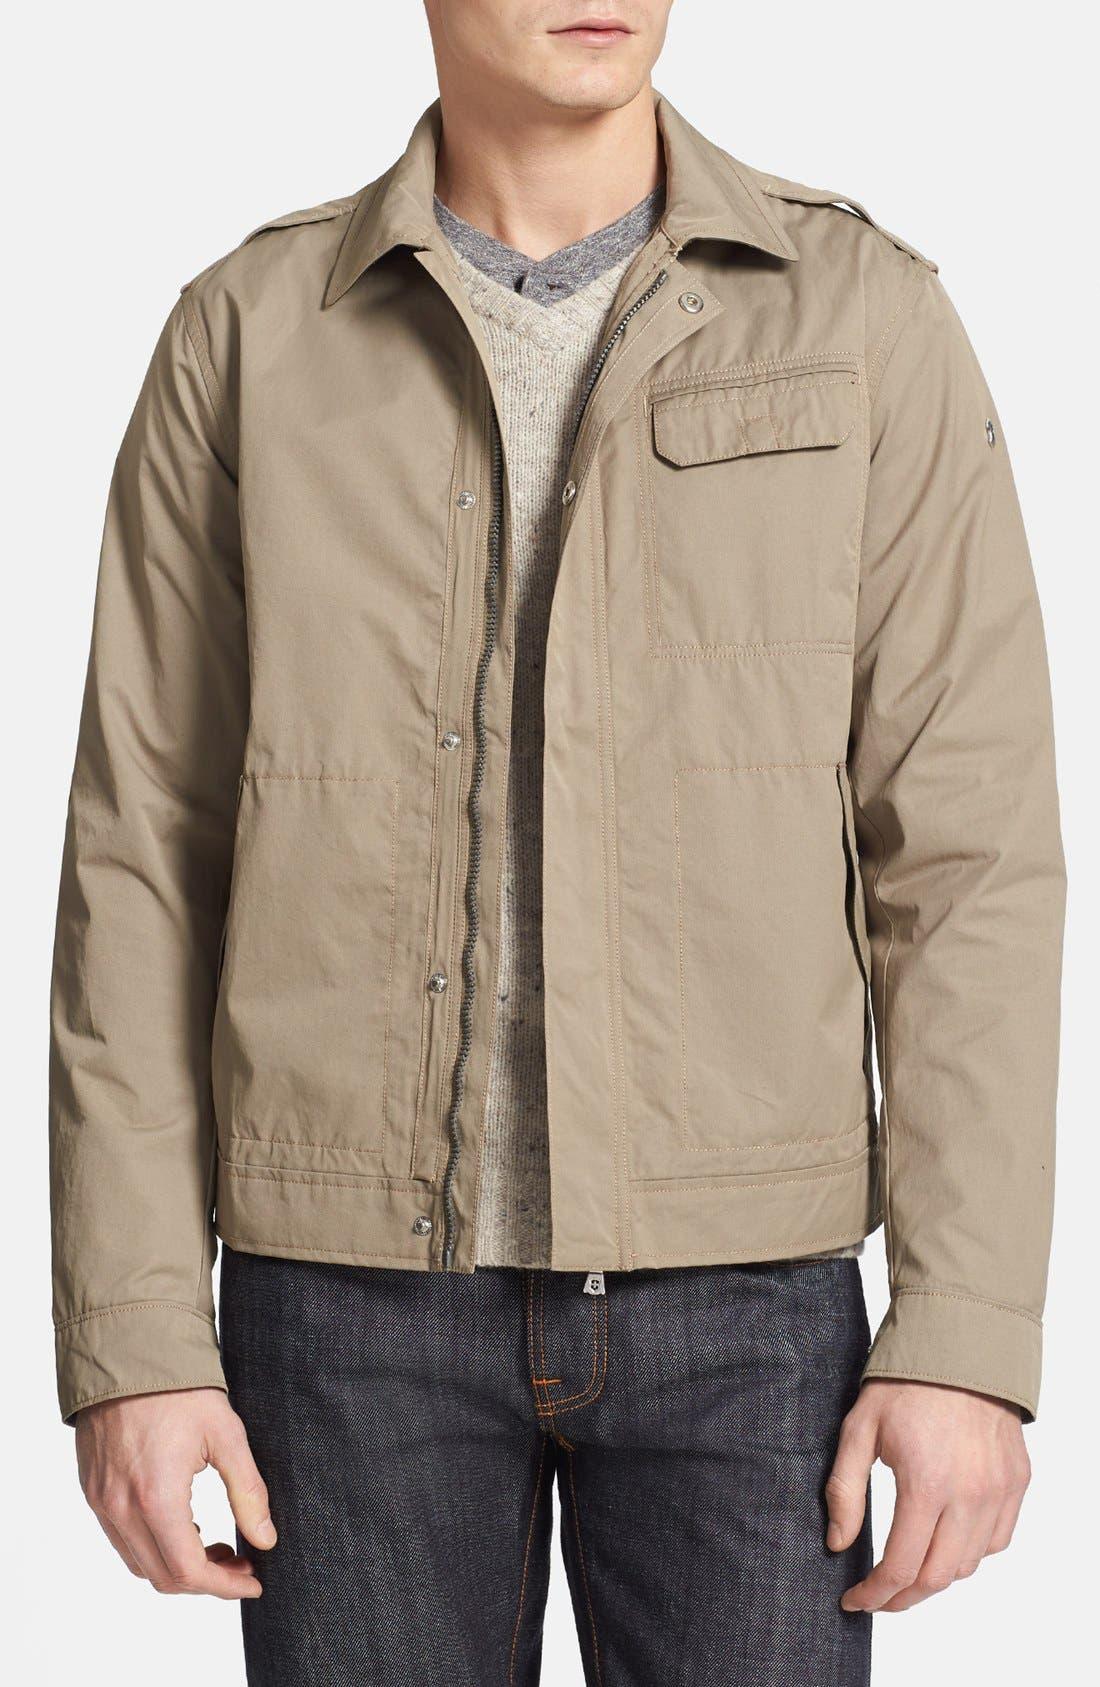 Alternate Image 1 Selected - Victorinox Swiss Army® 'Bodman' Jacket